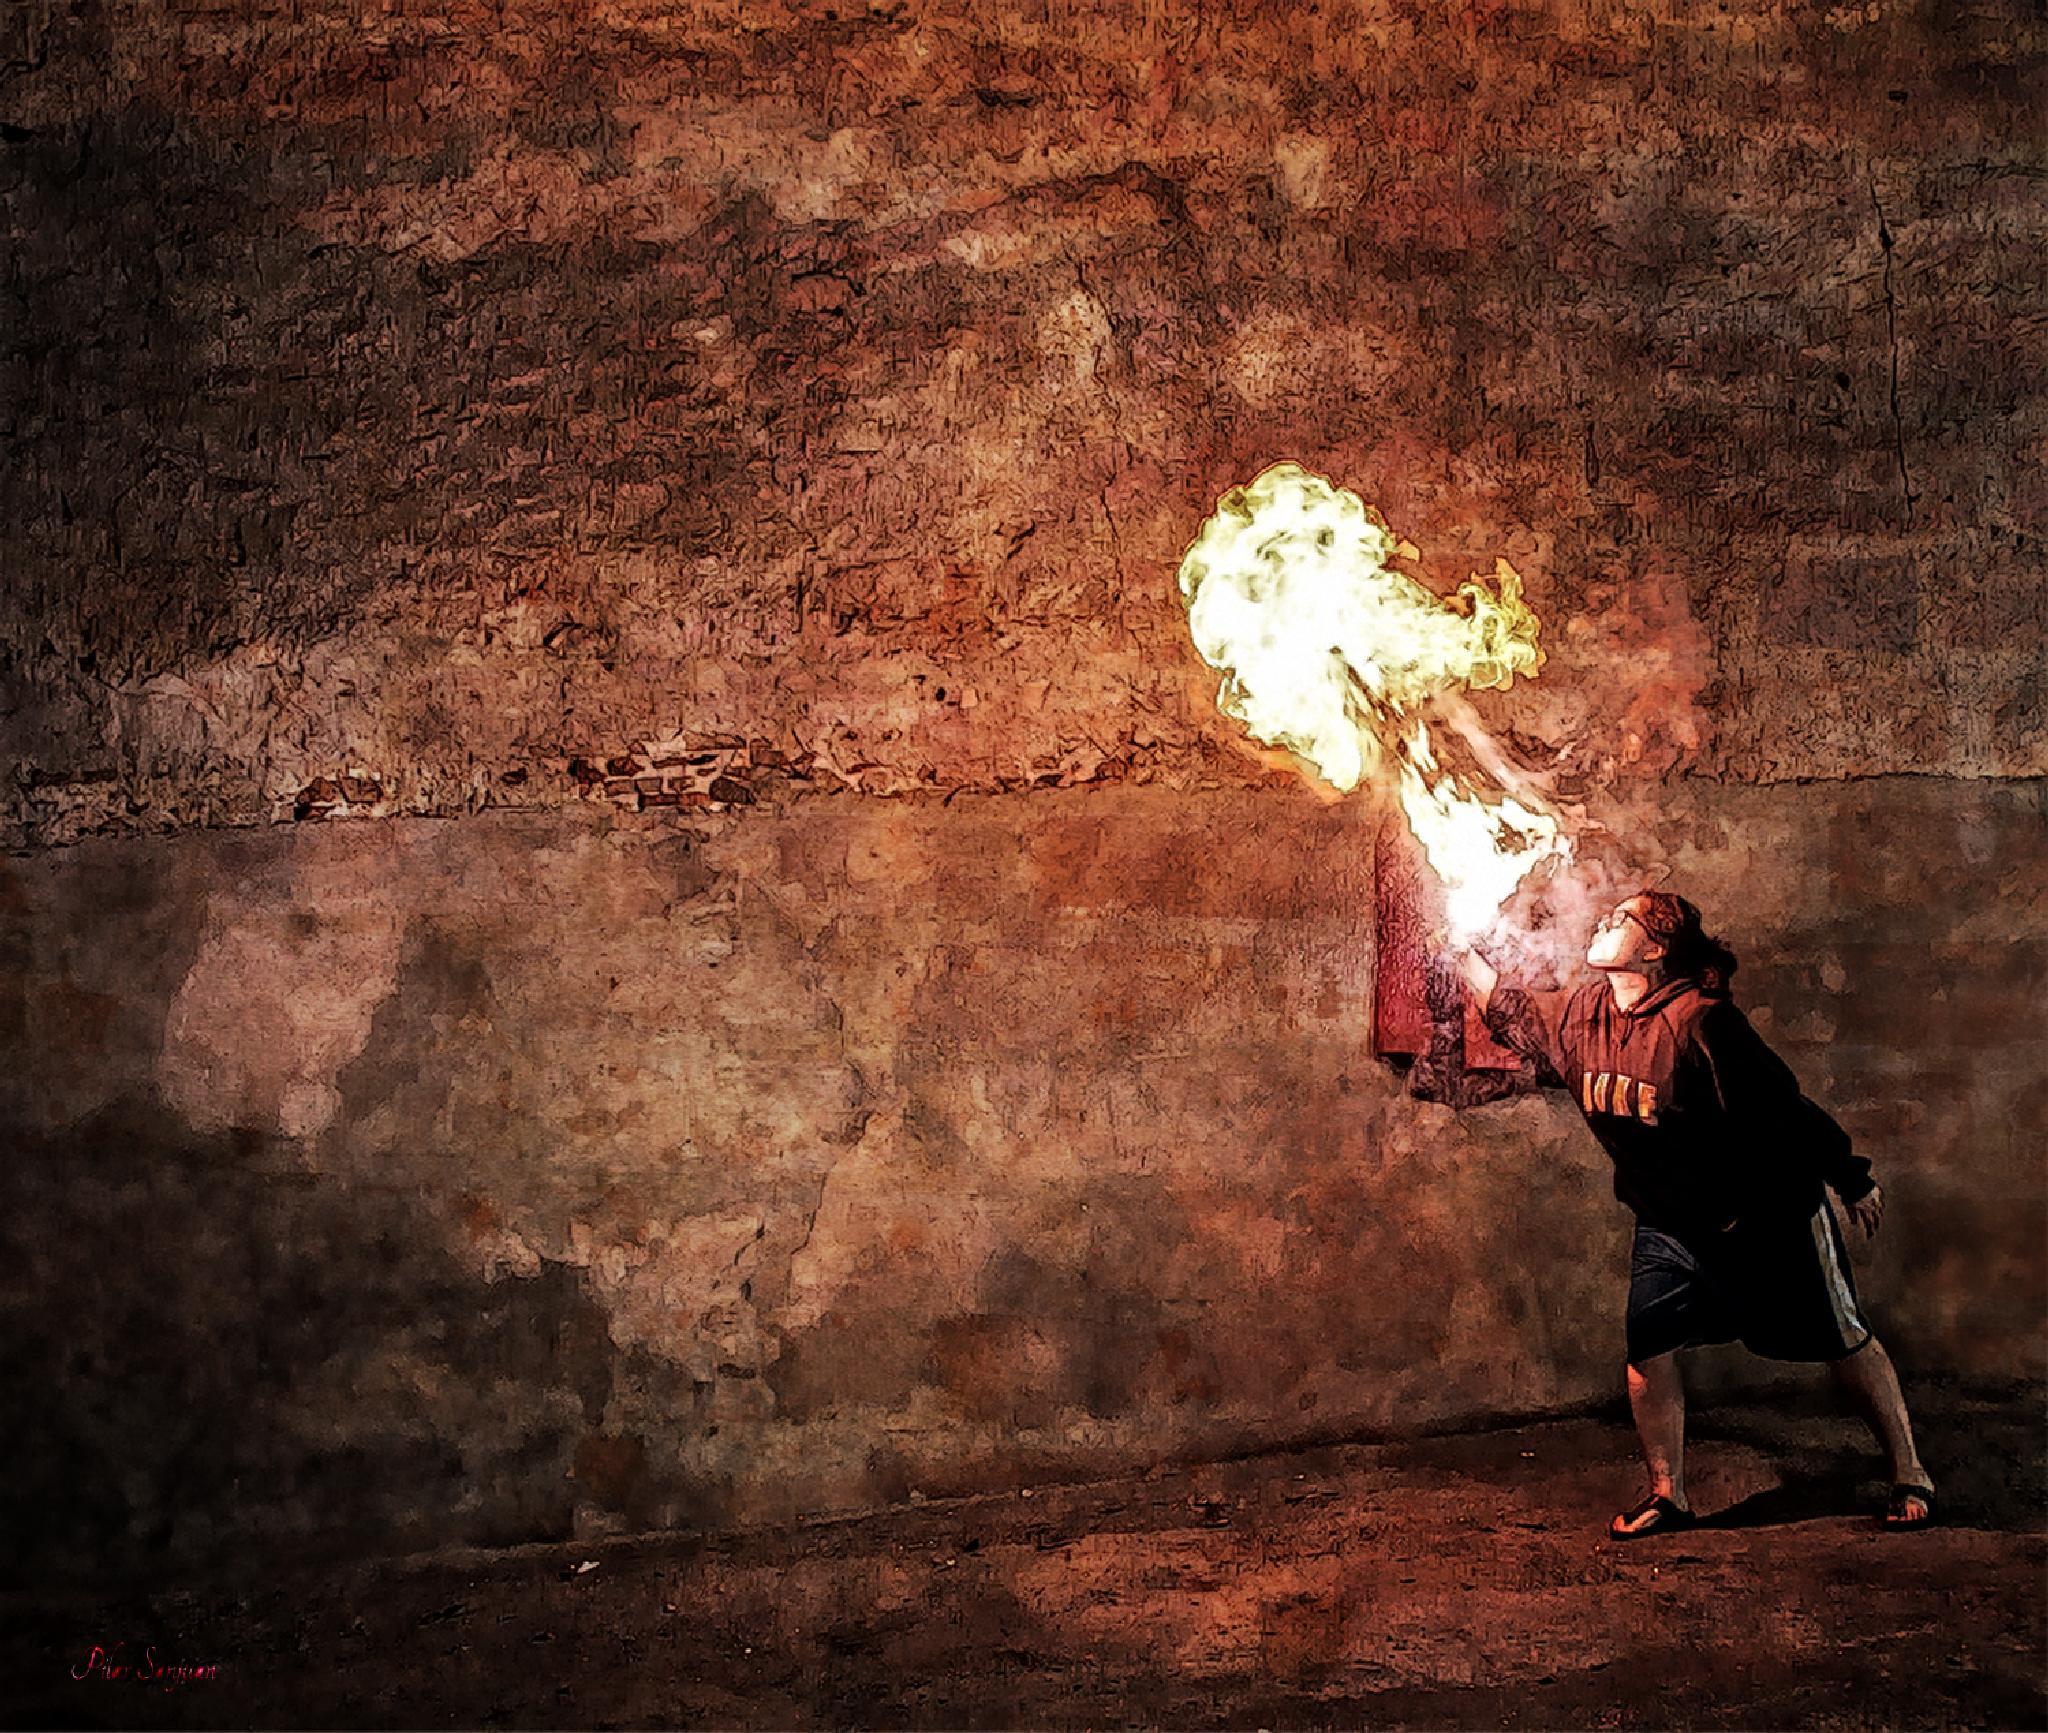 Dona de foc by Pilar